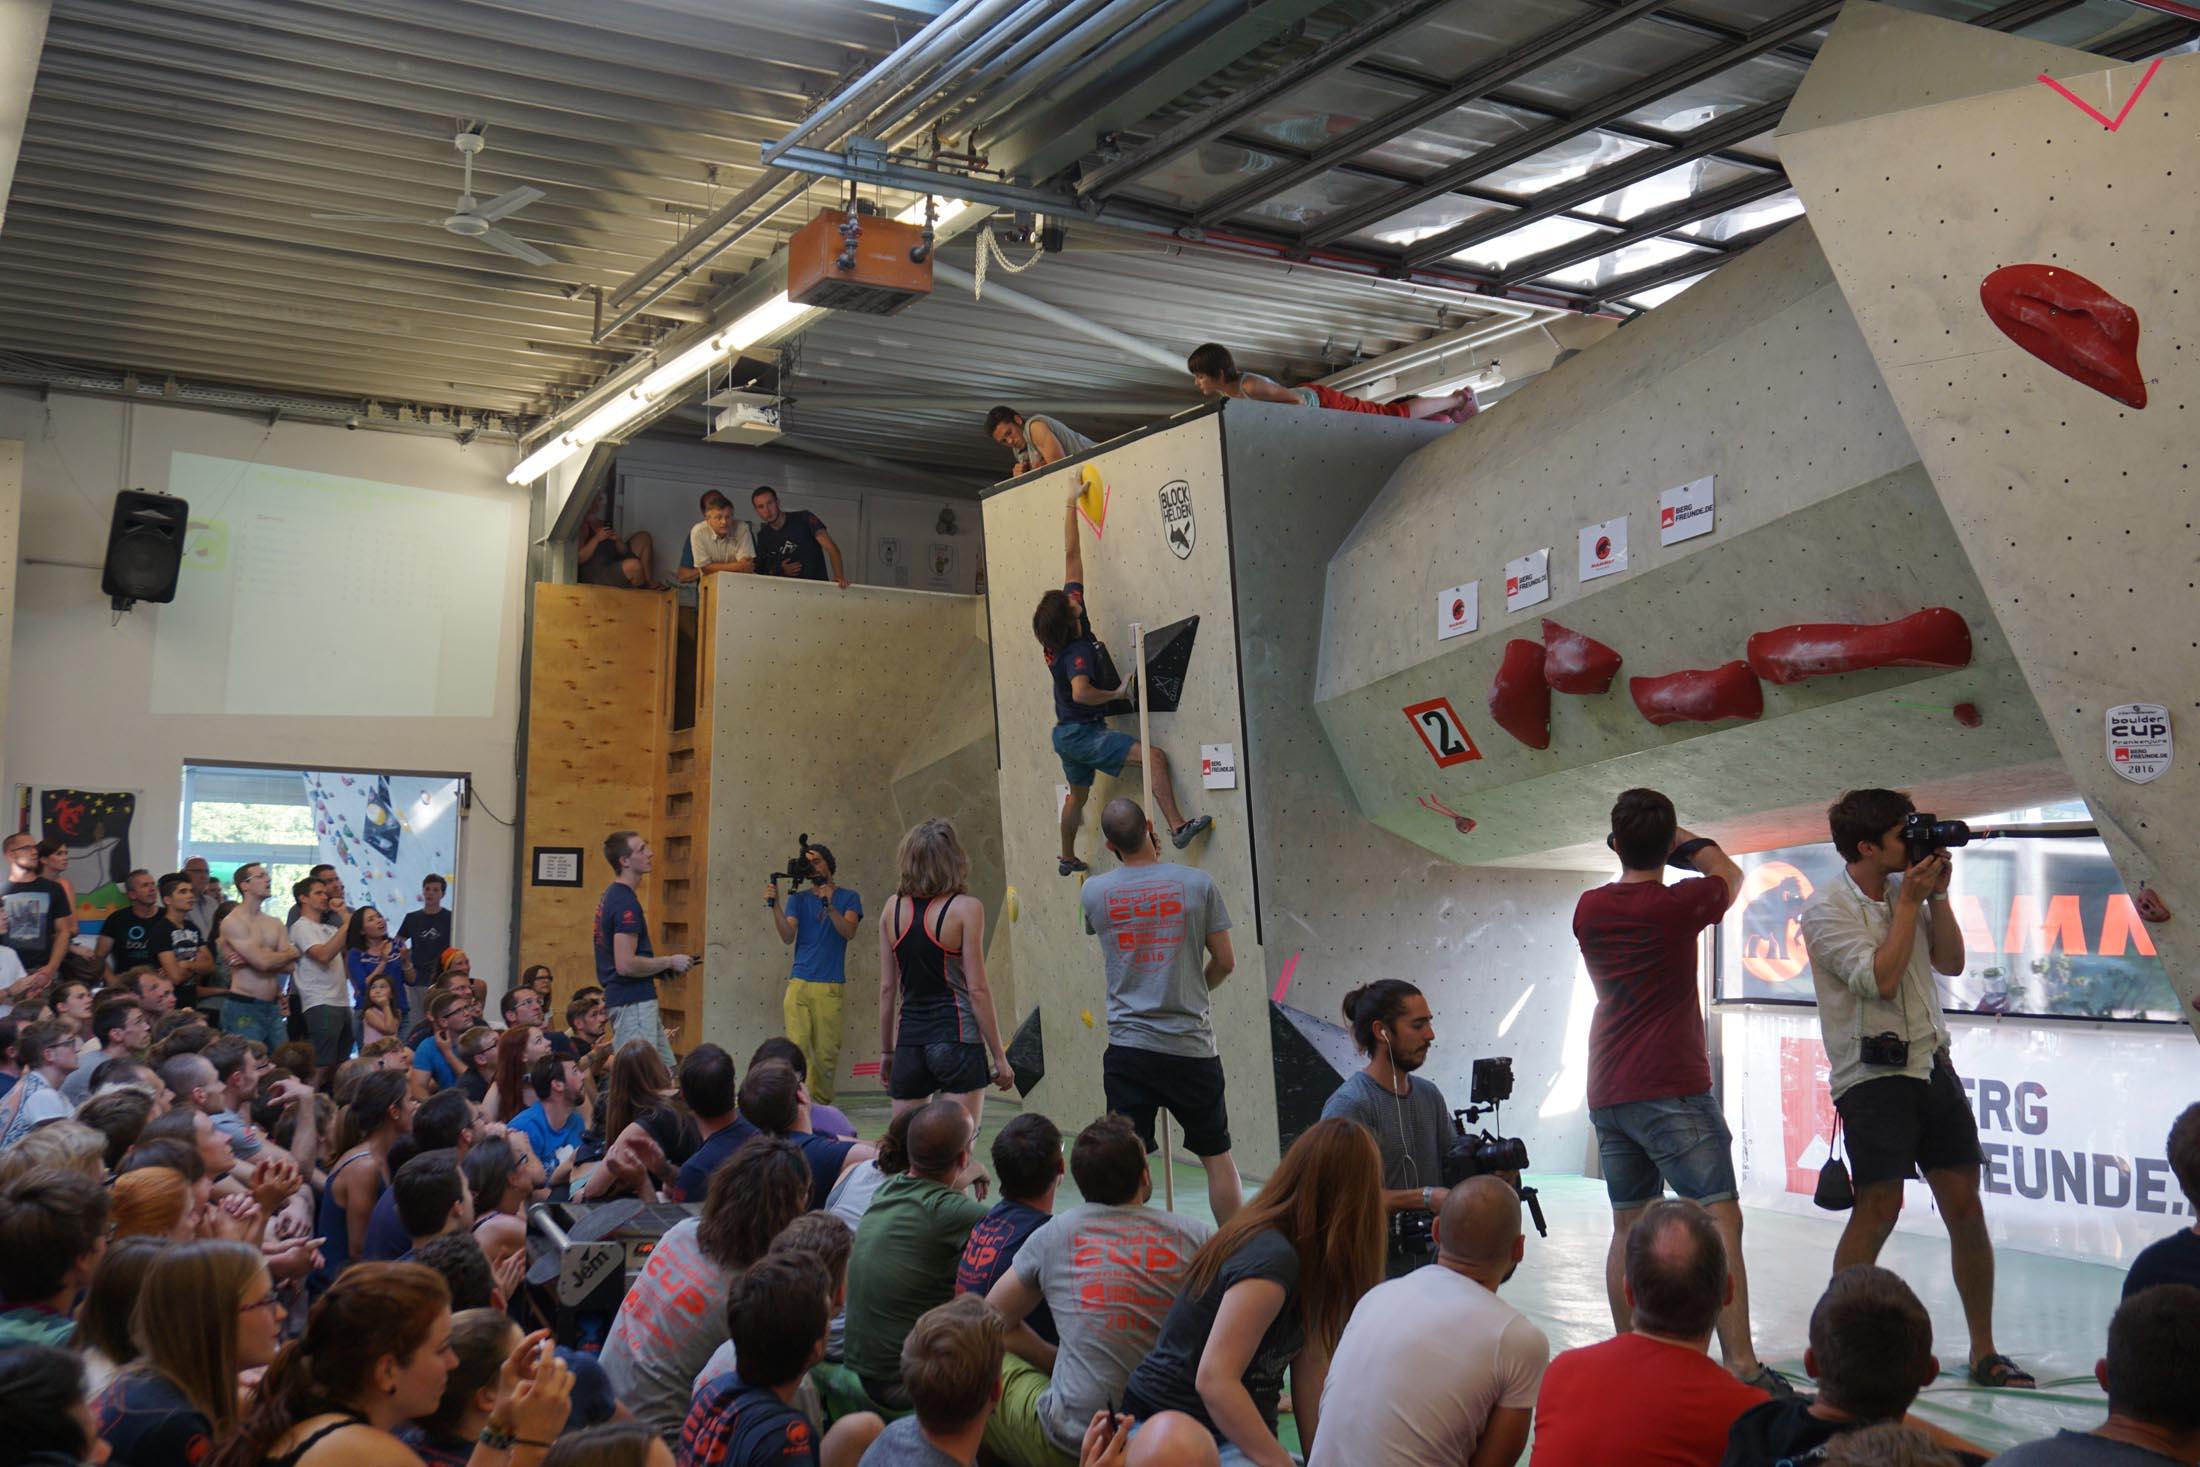 Finale, internationaler bouldercup Frankenjura 2016, BLOCKHELDEN Erlangen, Mammut, Bergfreunde.de, Boulderwettkampf07092016526